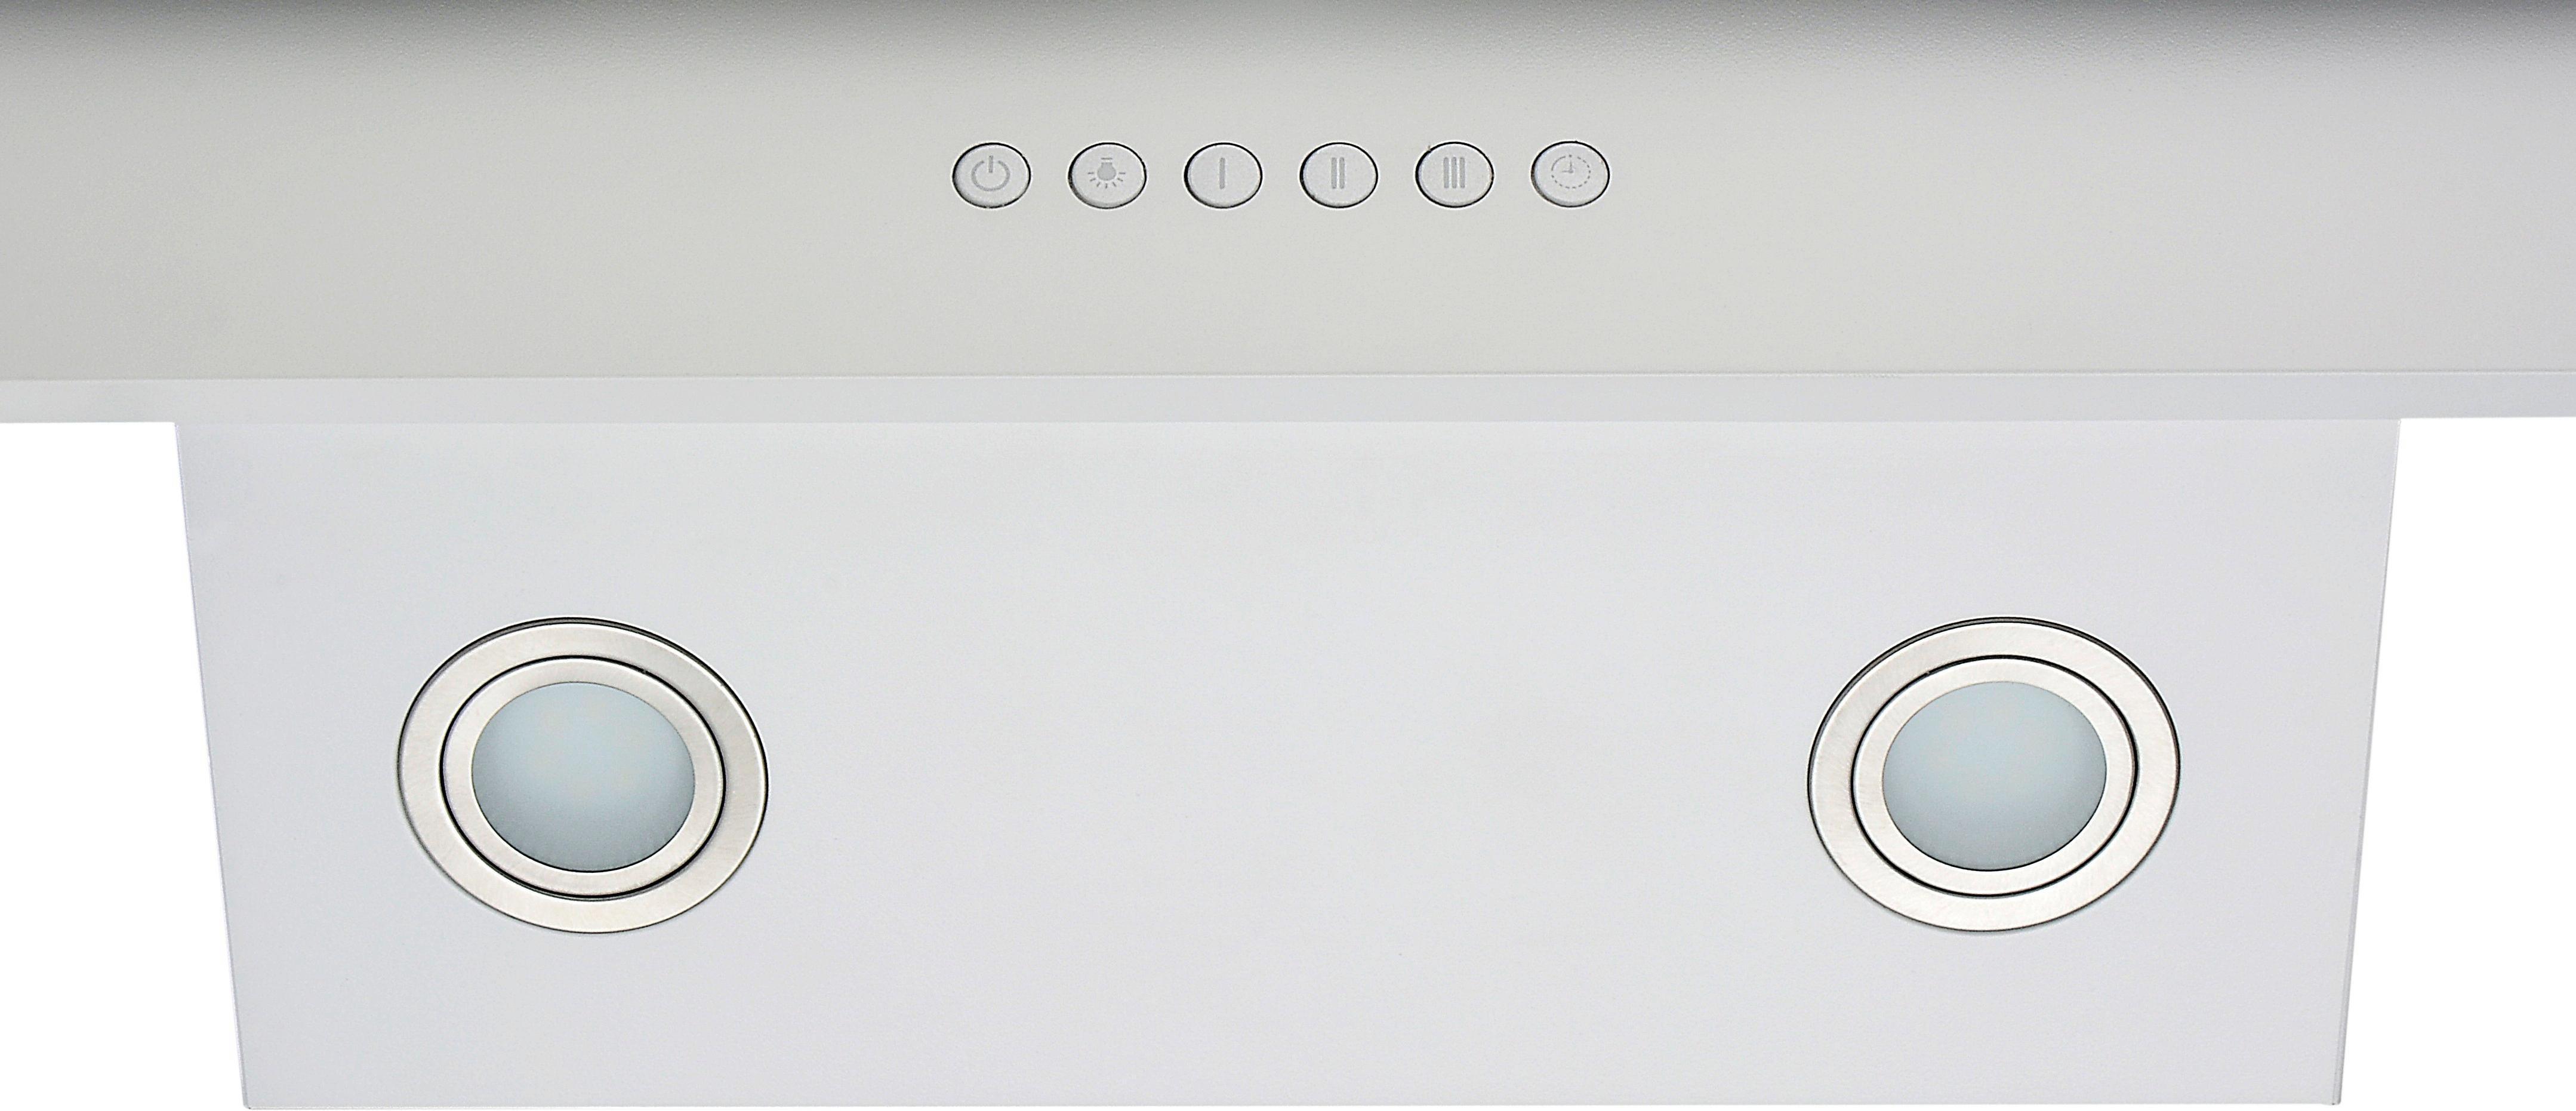 Dunstabzugshaube Ch 66038-60 W - Weiß, MODERN, Metall (60/70,2-100,2/41,8cm)